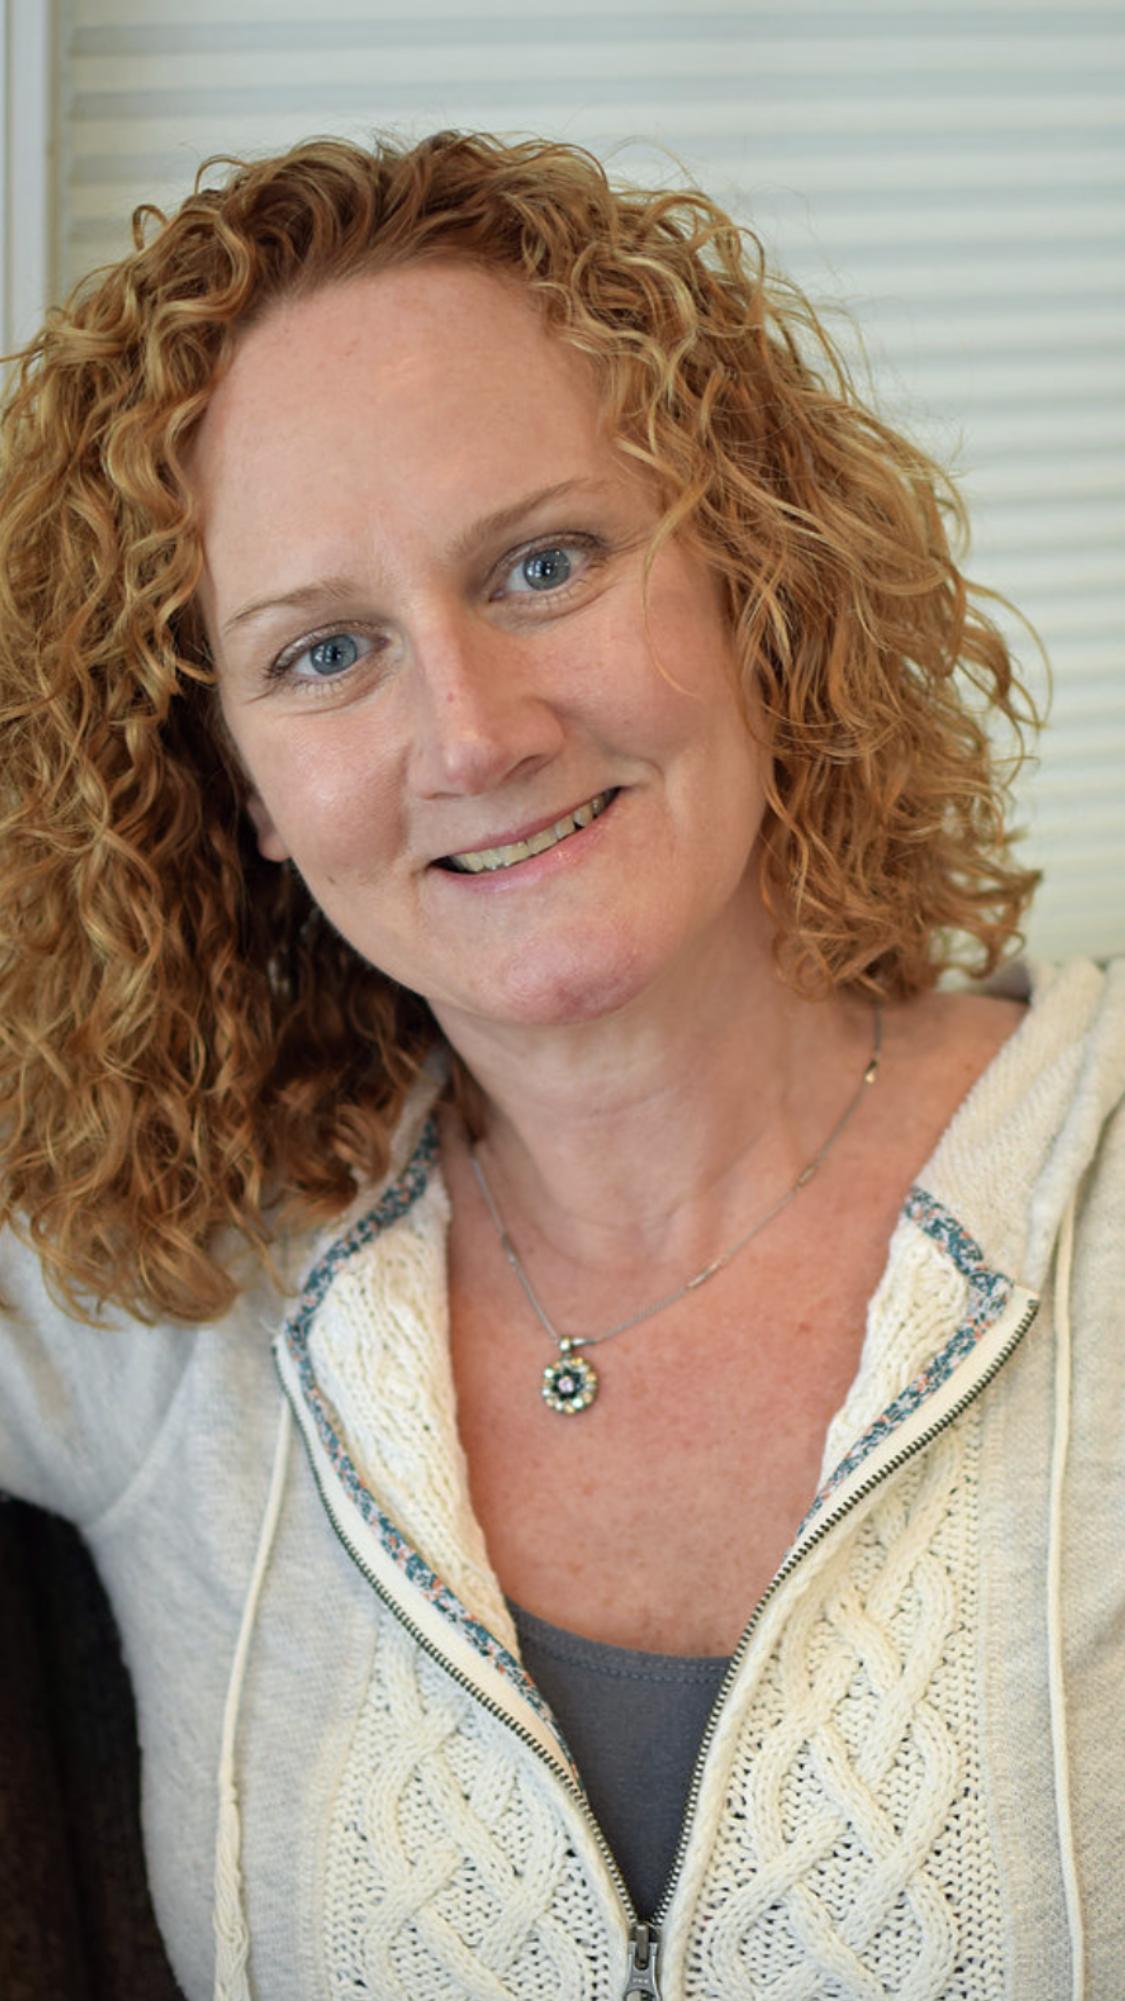 Colleen Myatt